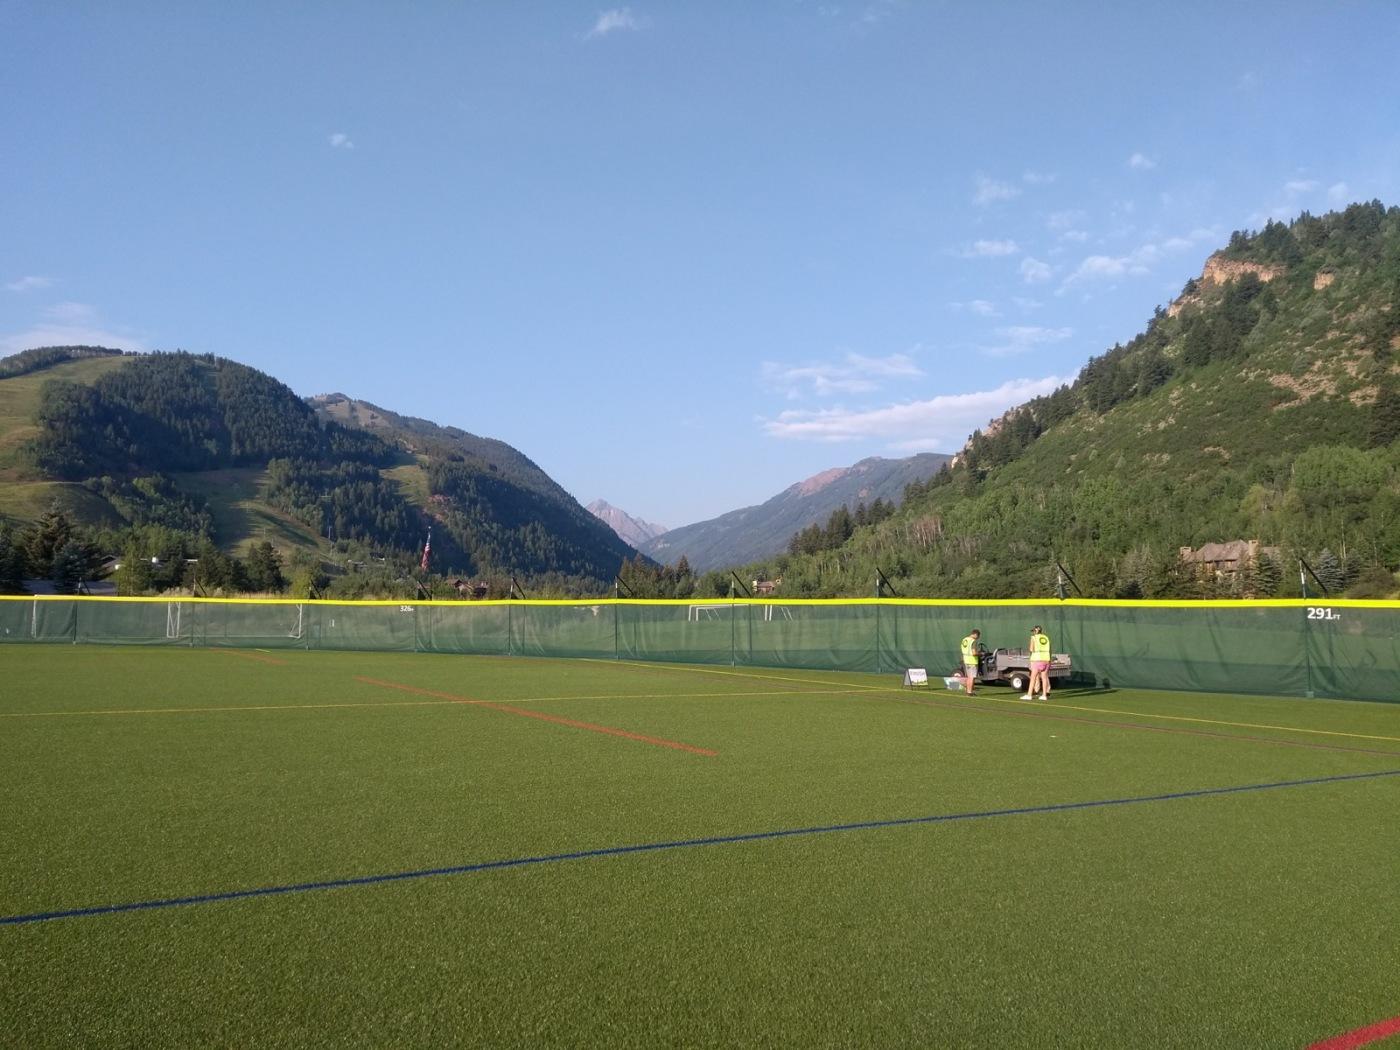 Aspen parkrun start - on the playing fields